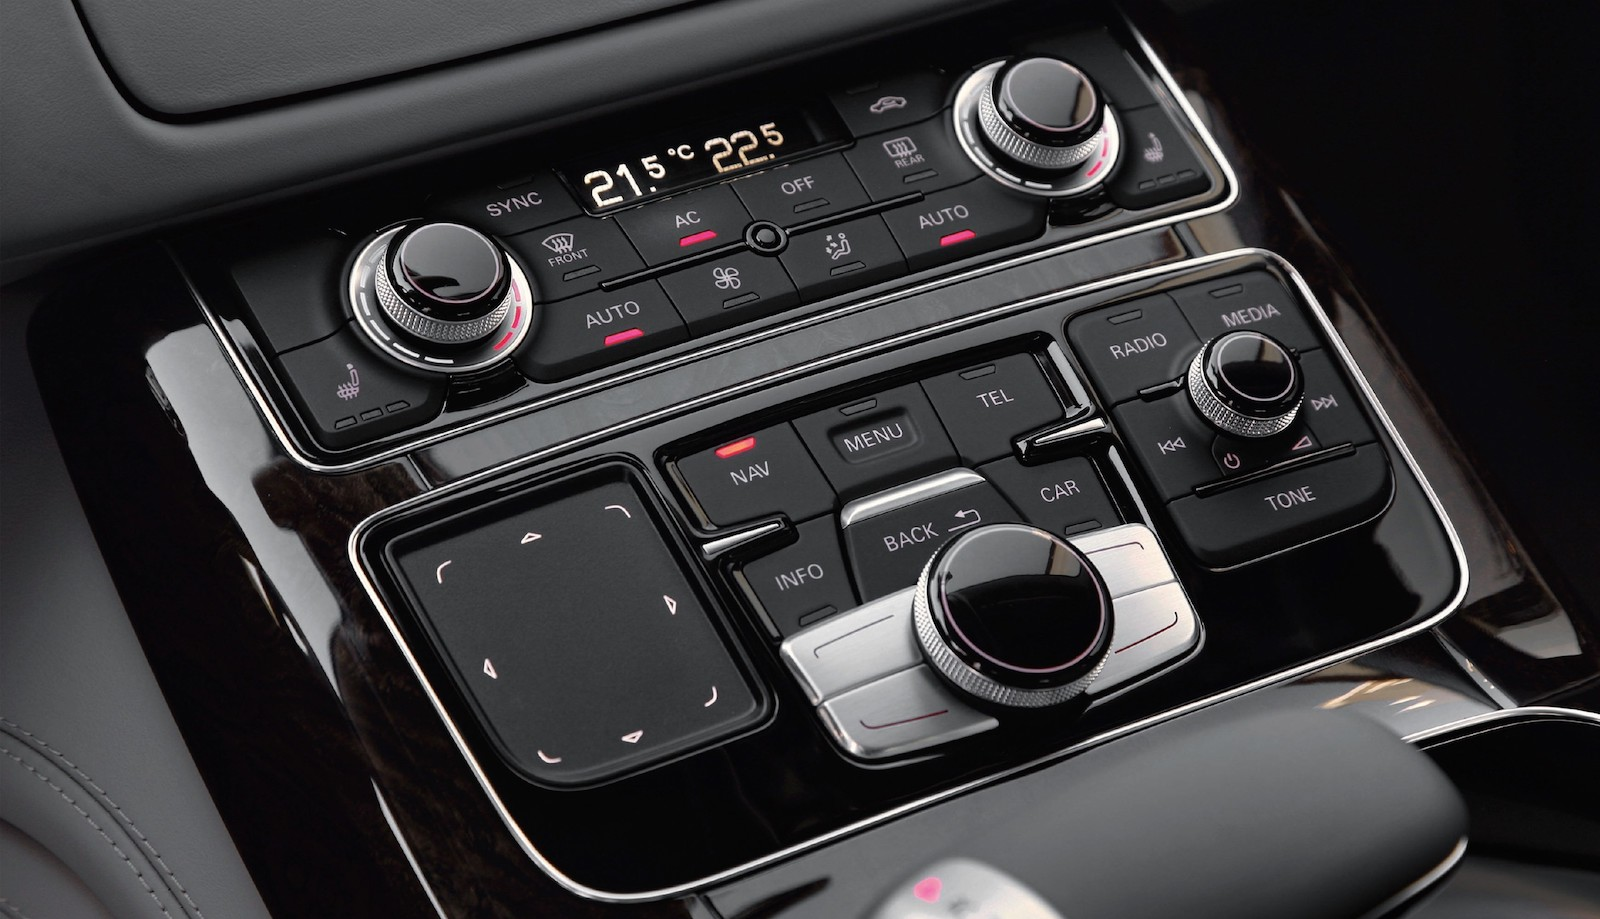 2003-Audi_MMI_controller-1